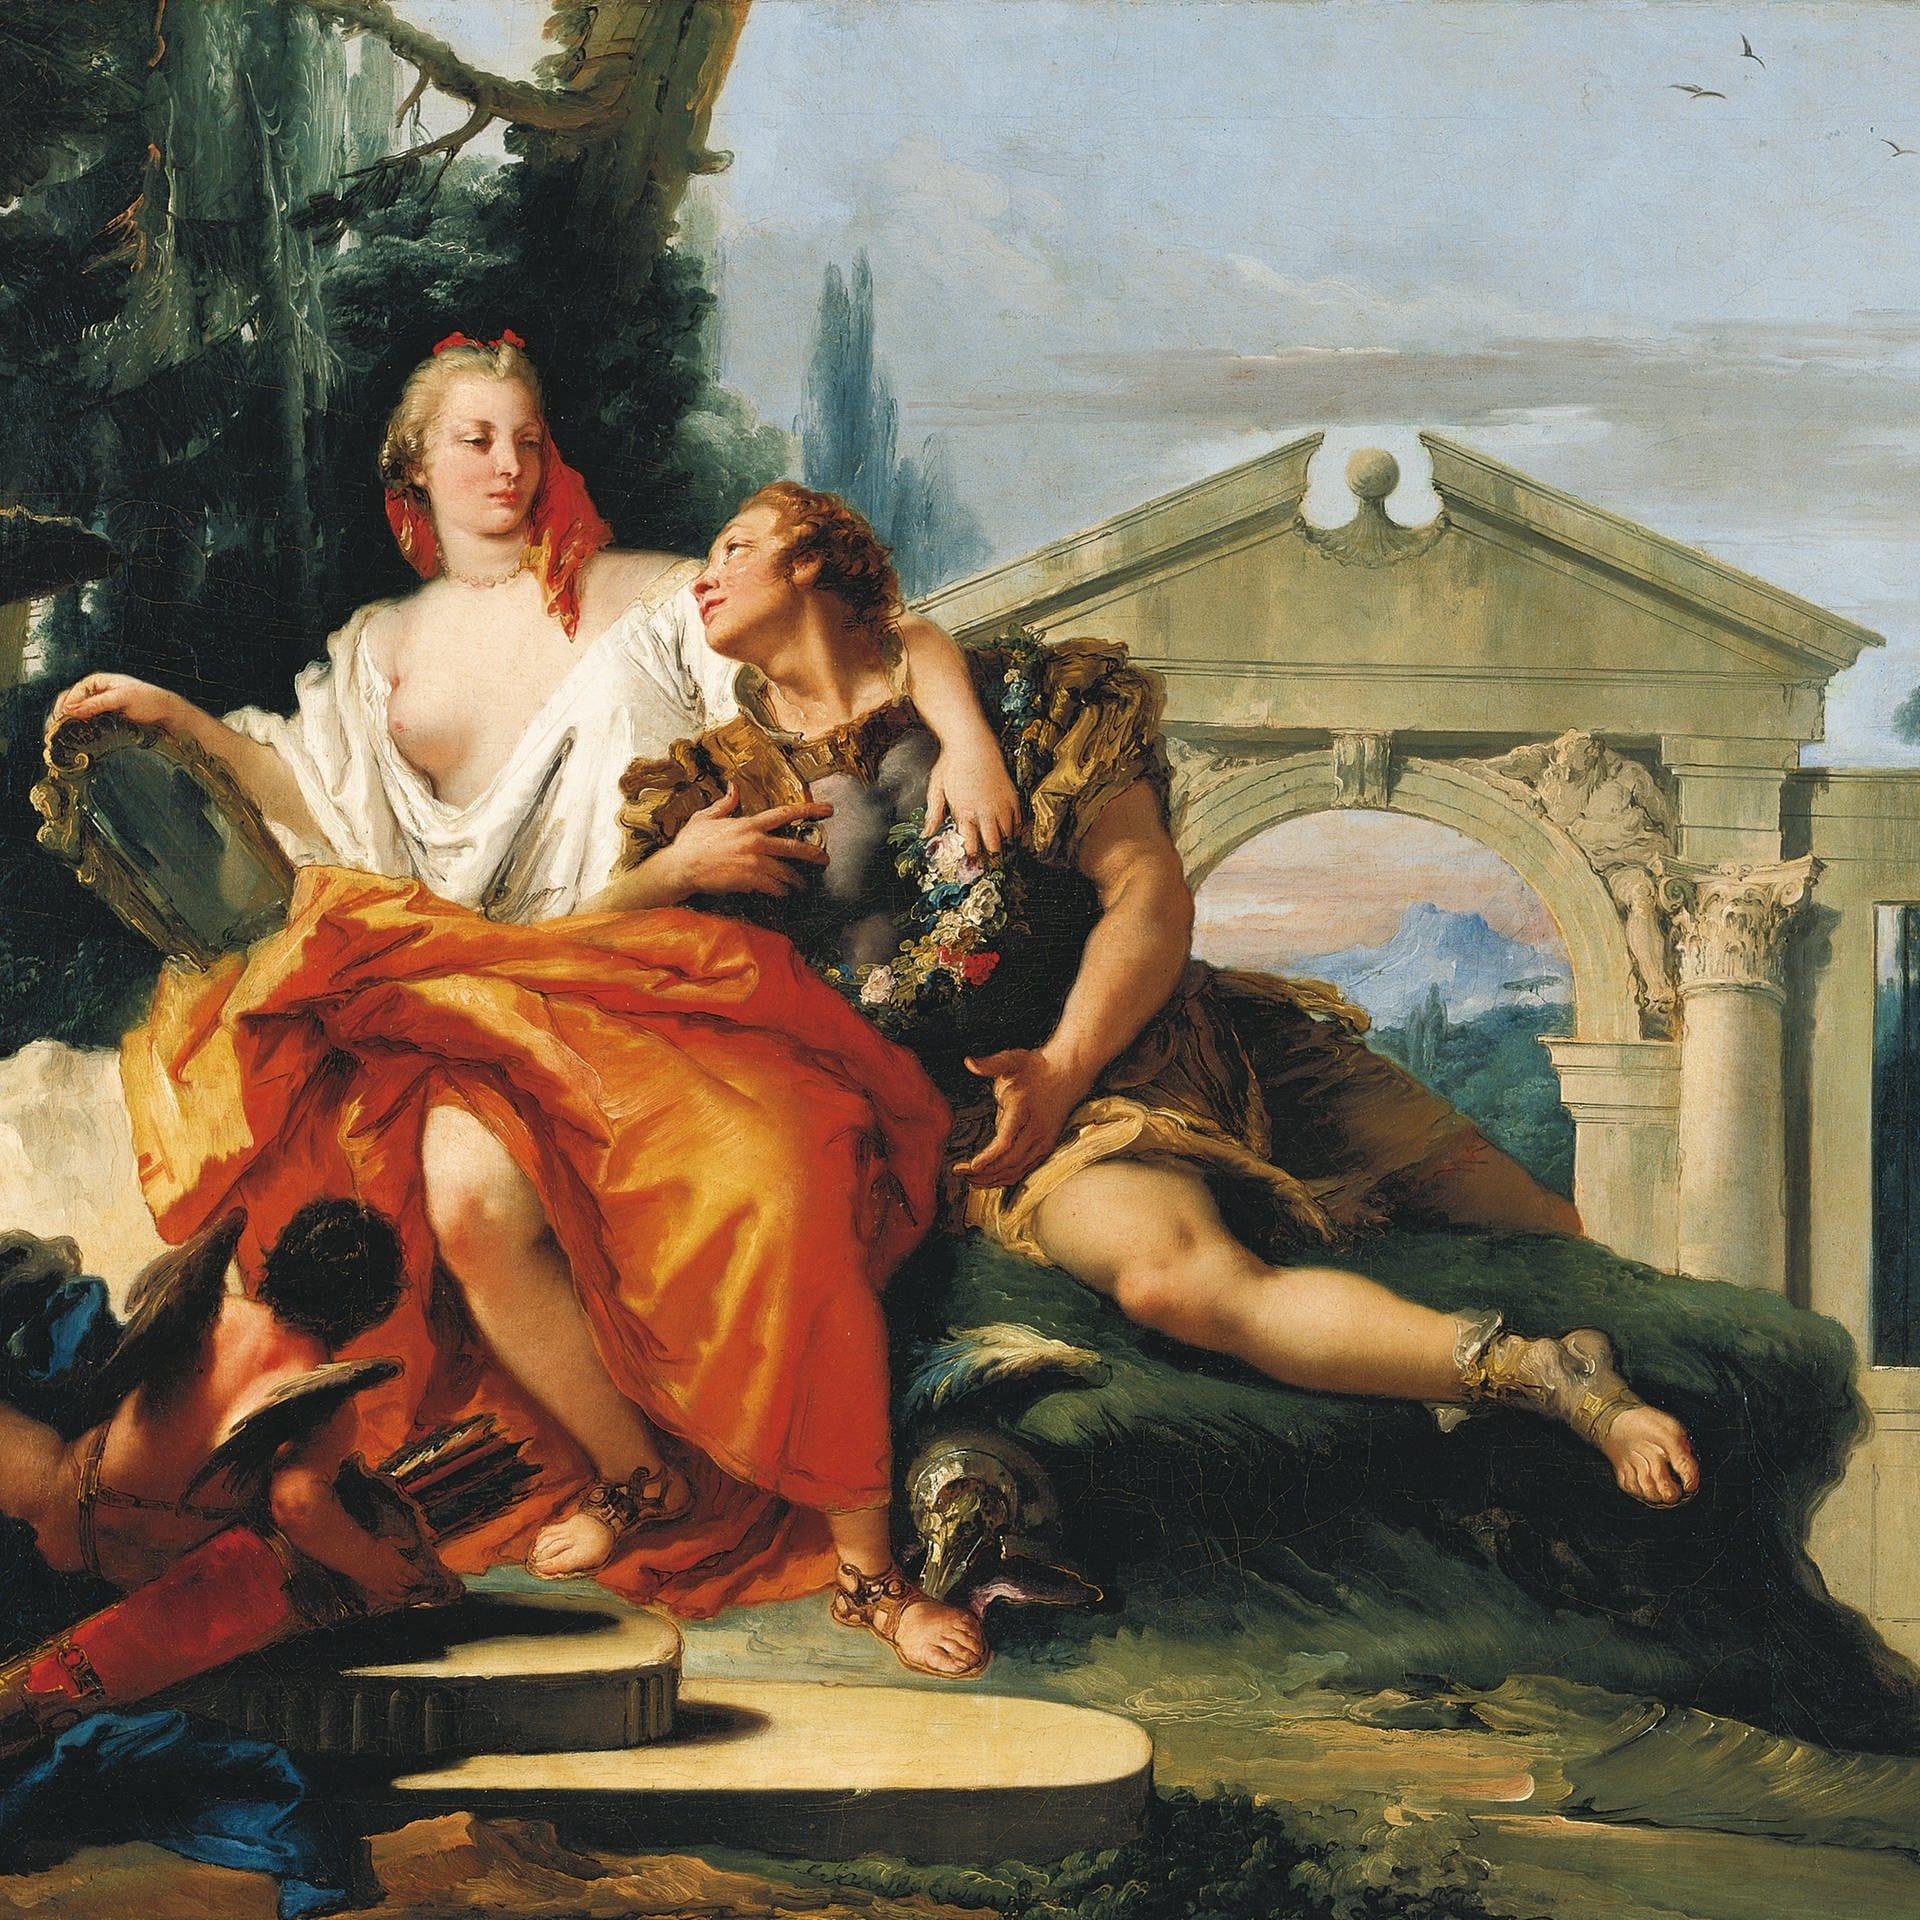 Tiepolos Malerei - Dem Himmel so nah